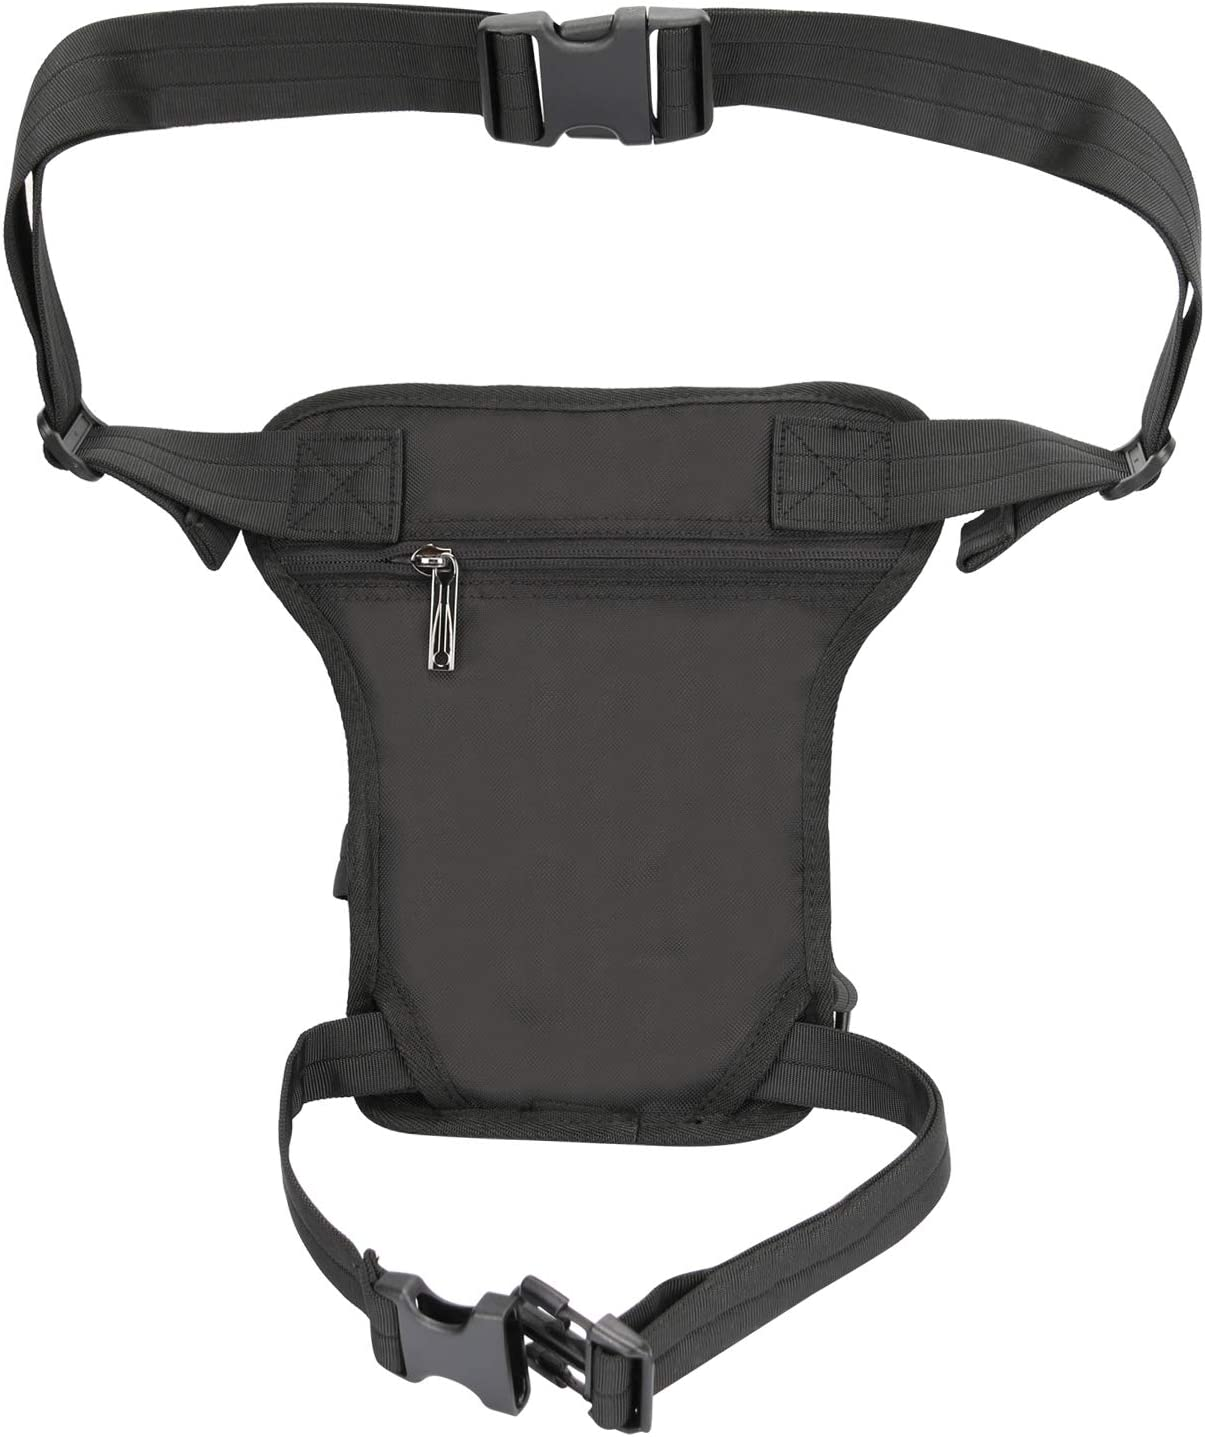 Thigh Bag Leg Bag Vanlison Tactical Fanny Pack Hiking Bag Leg Pouch